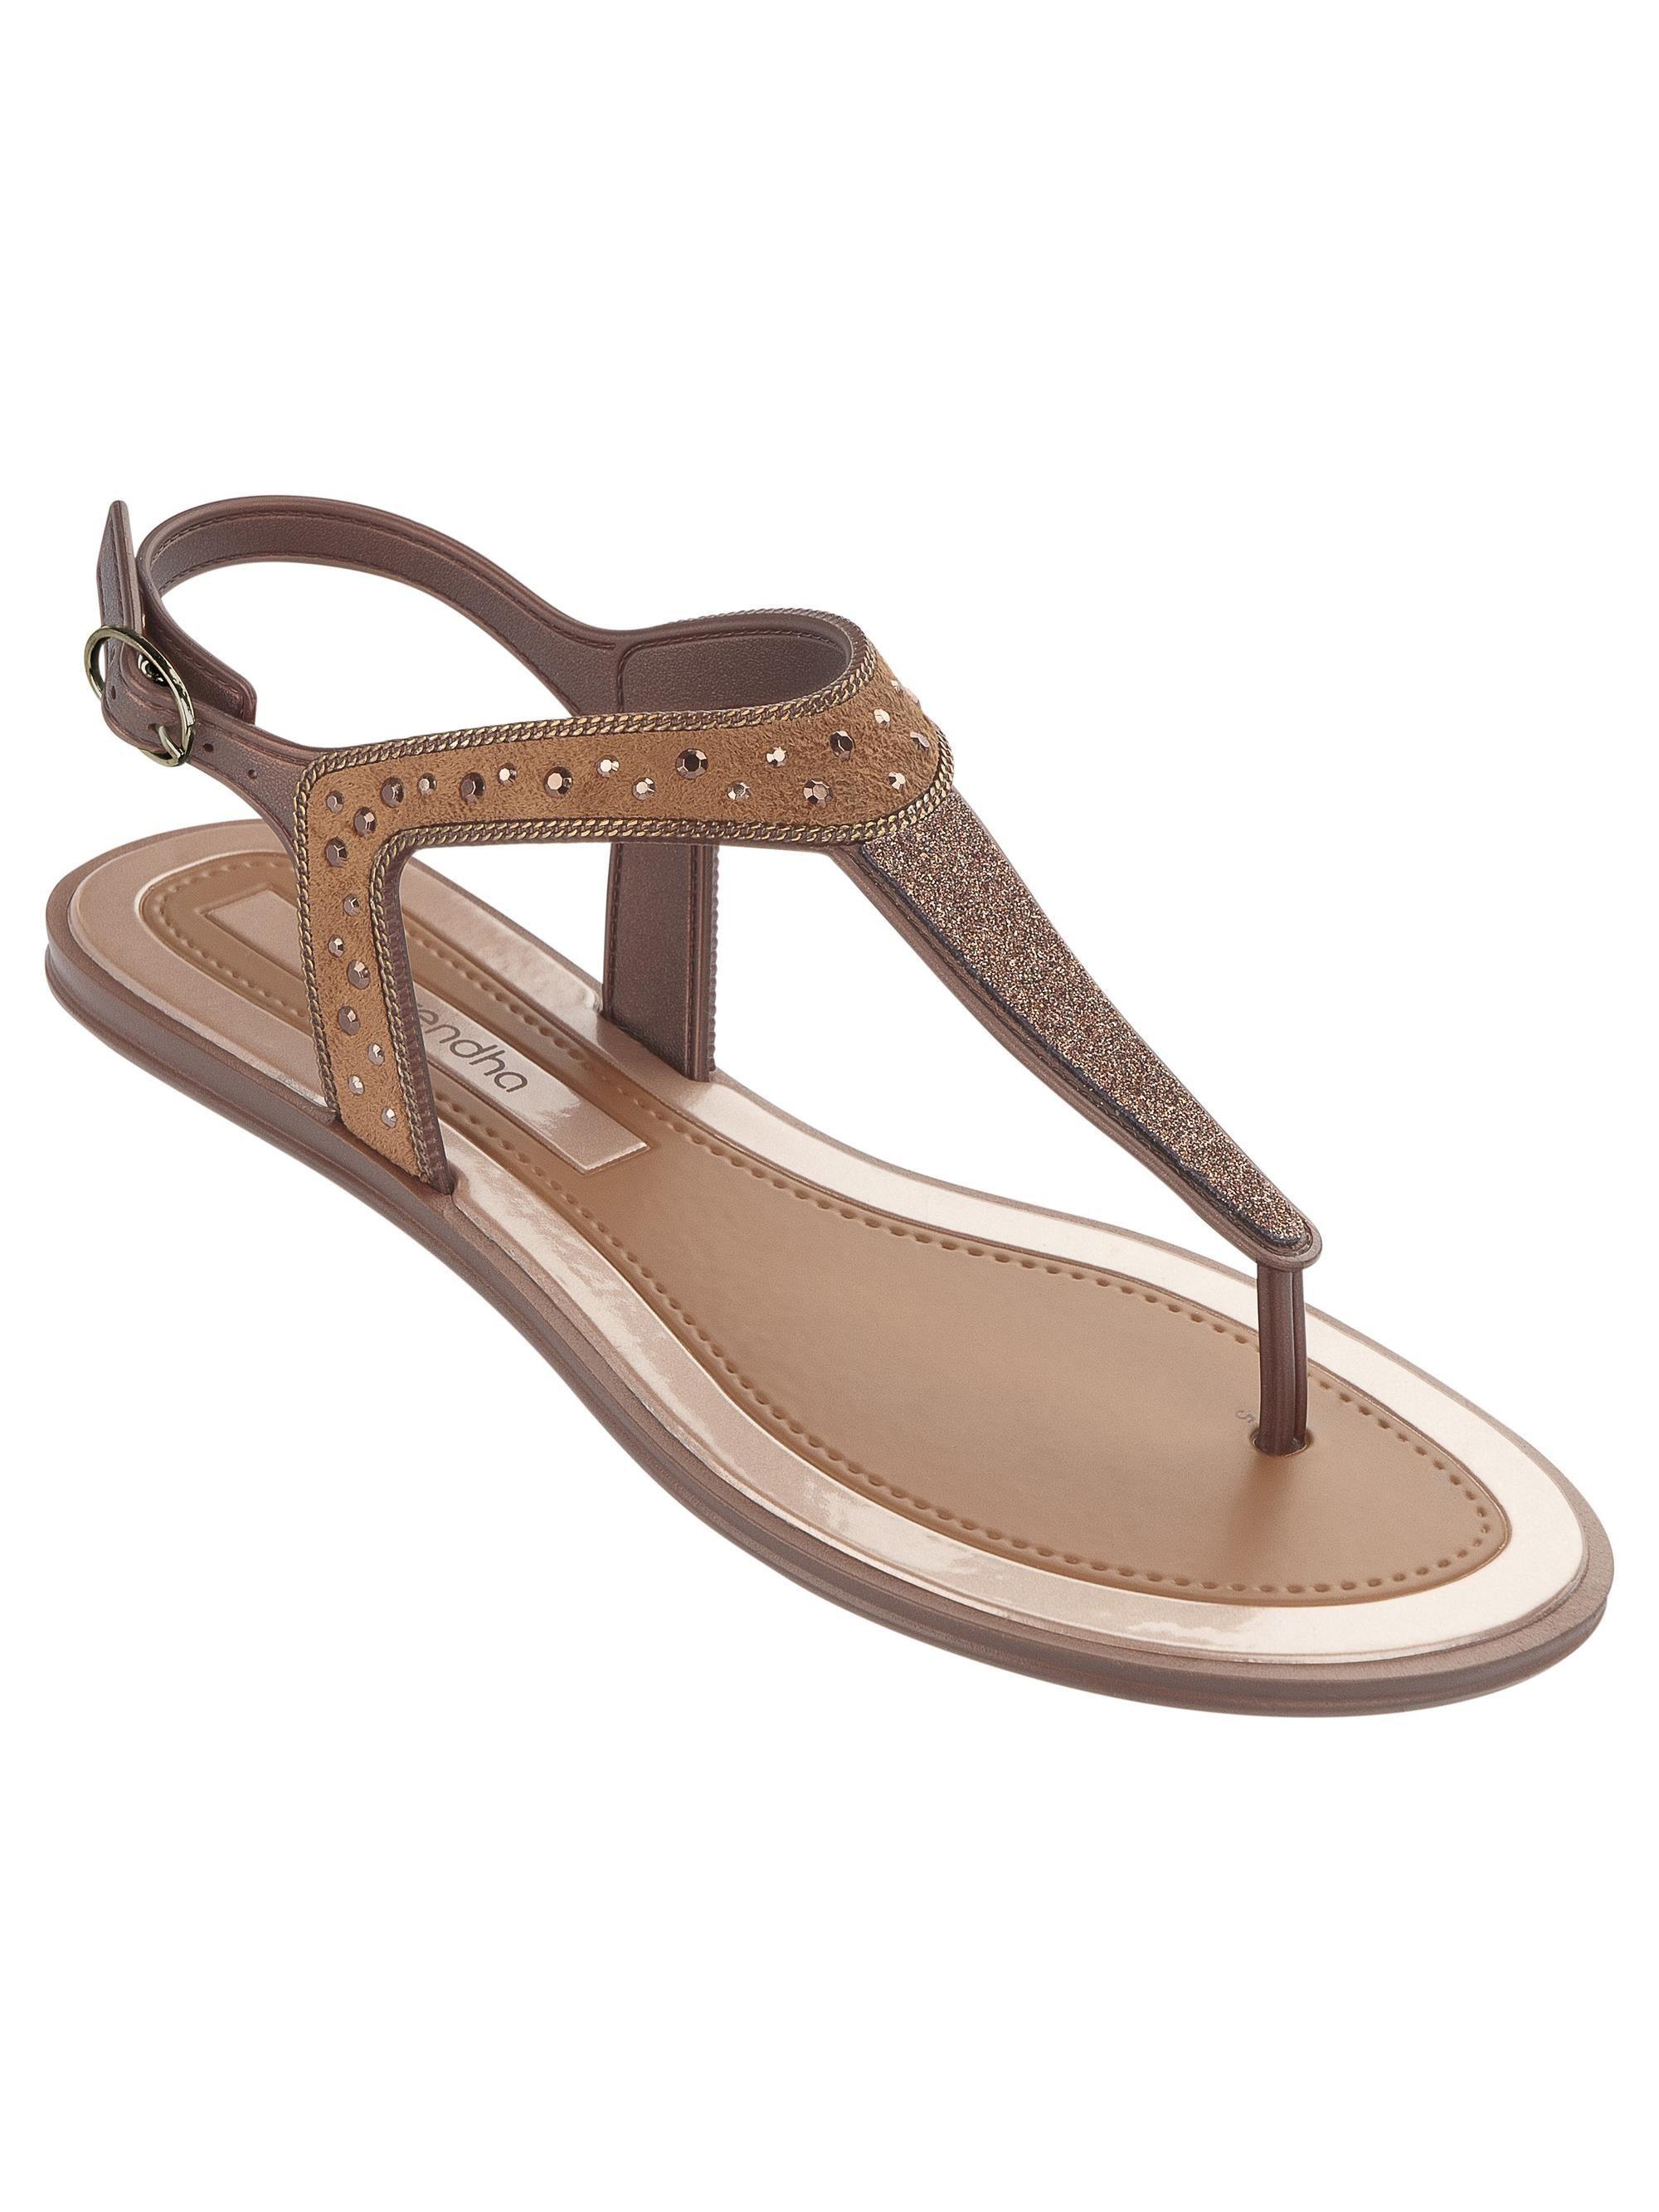 Grendha Golden Thong Flip flops de femme / Sandales. idRSqs